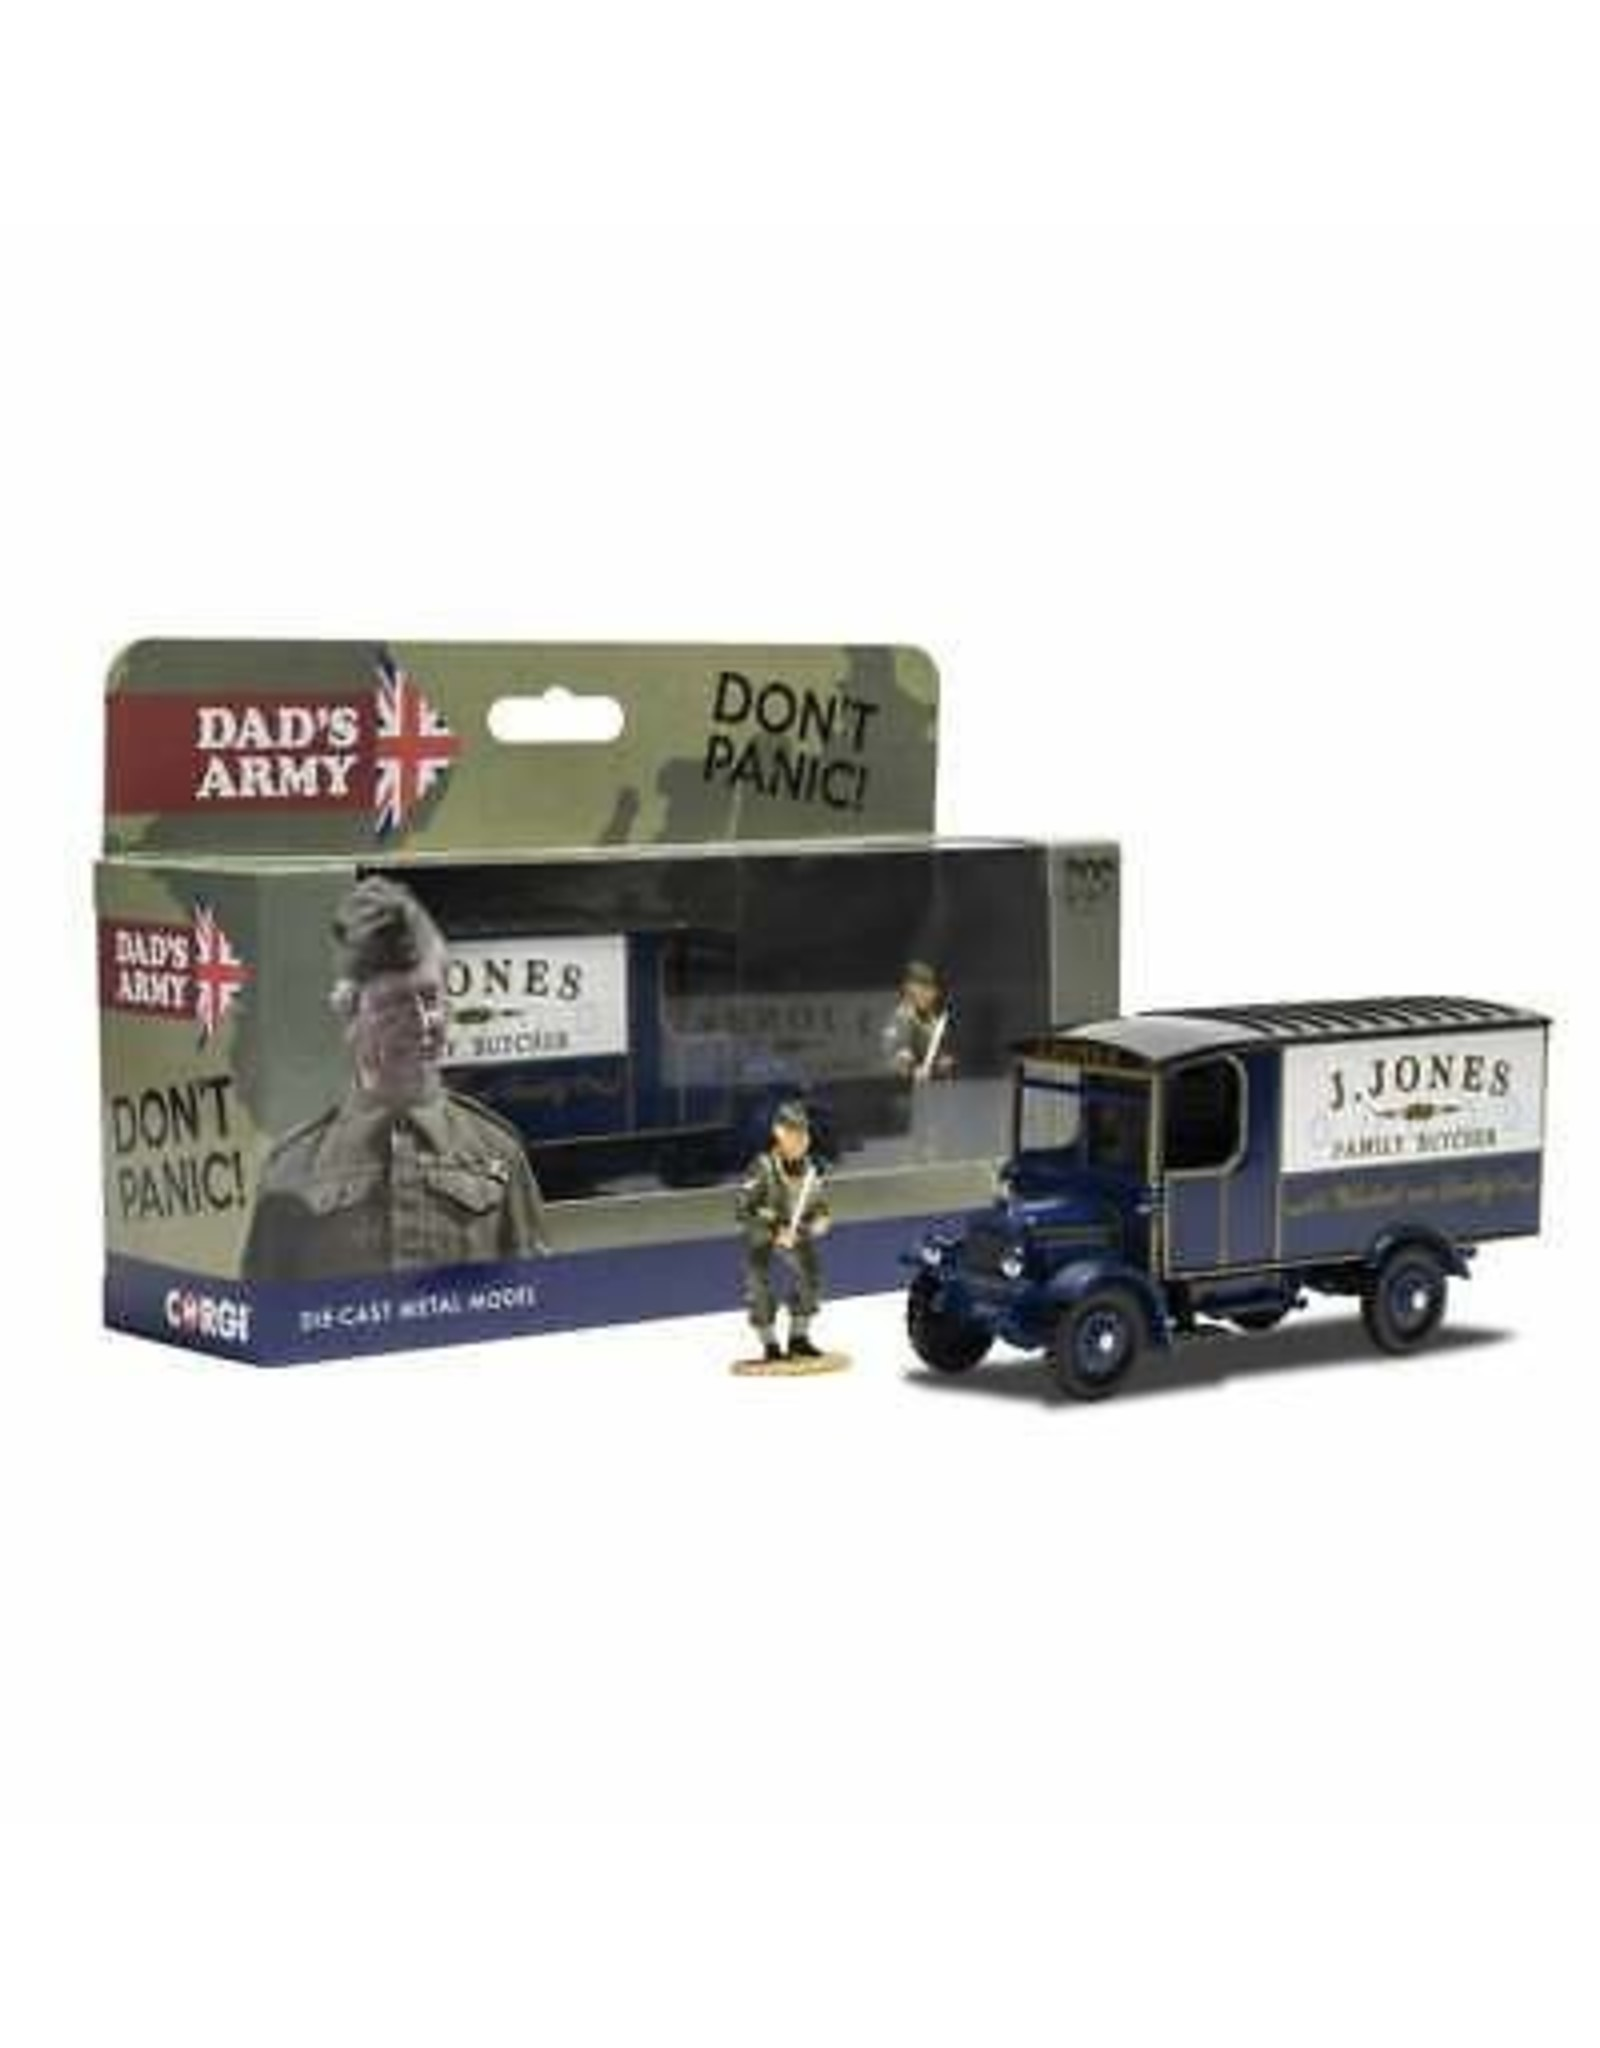 Thornycroft Thornycroft Van RHD 'TV Series Dads Army'+ Figure Mr. Jones - 1:50 - Corgi